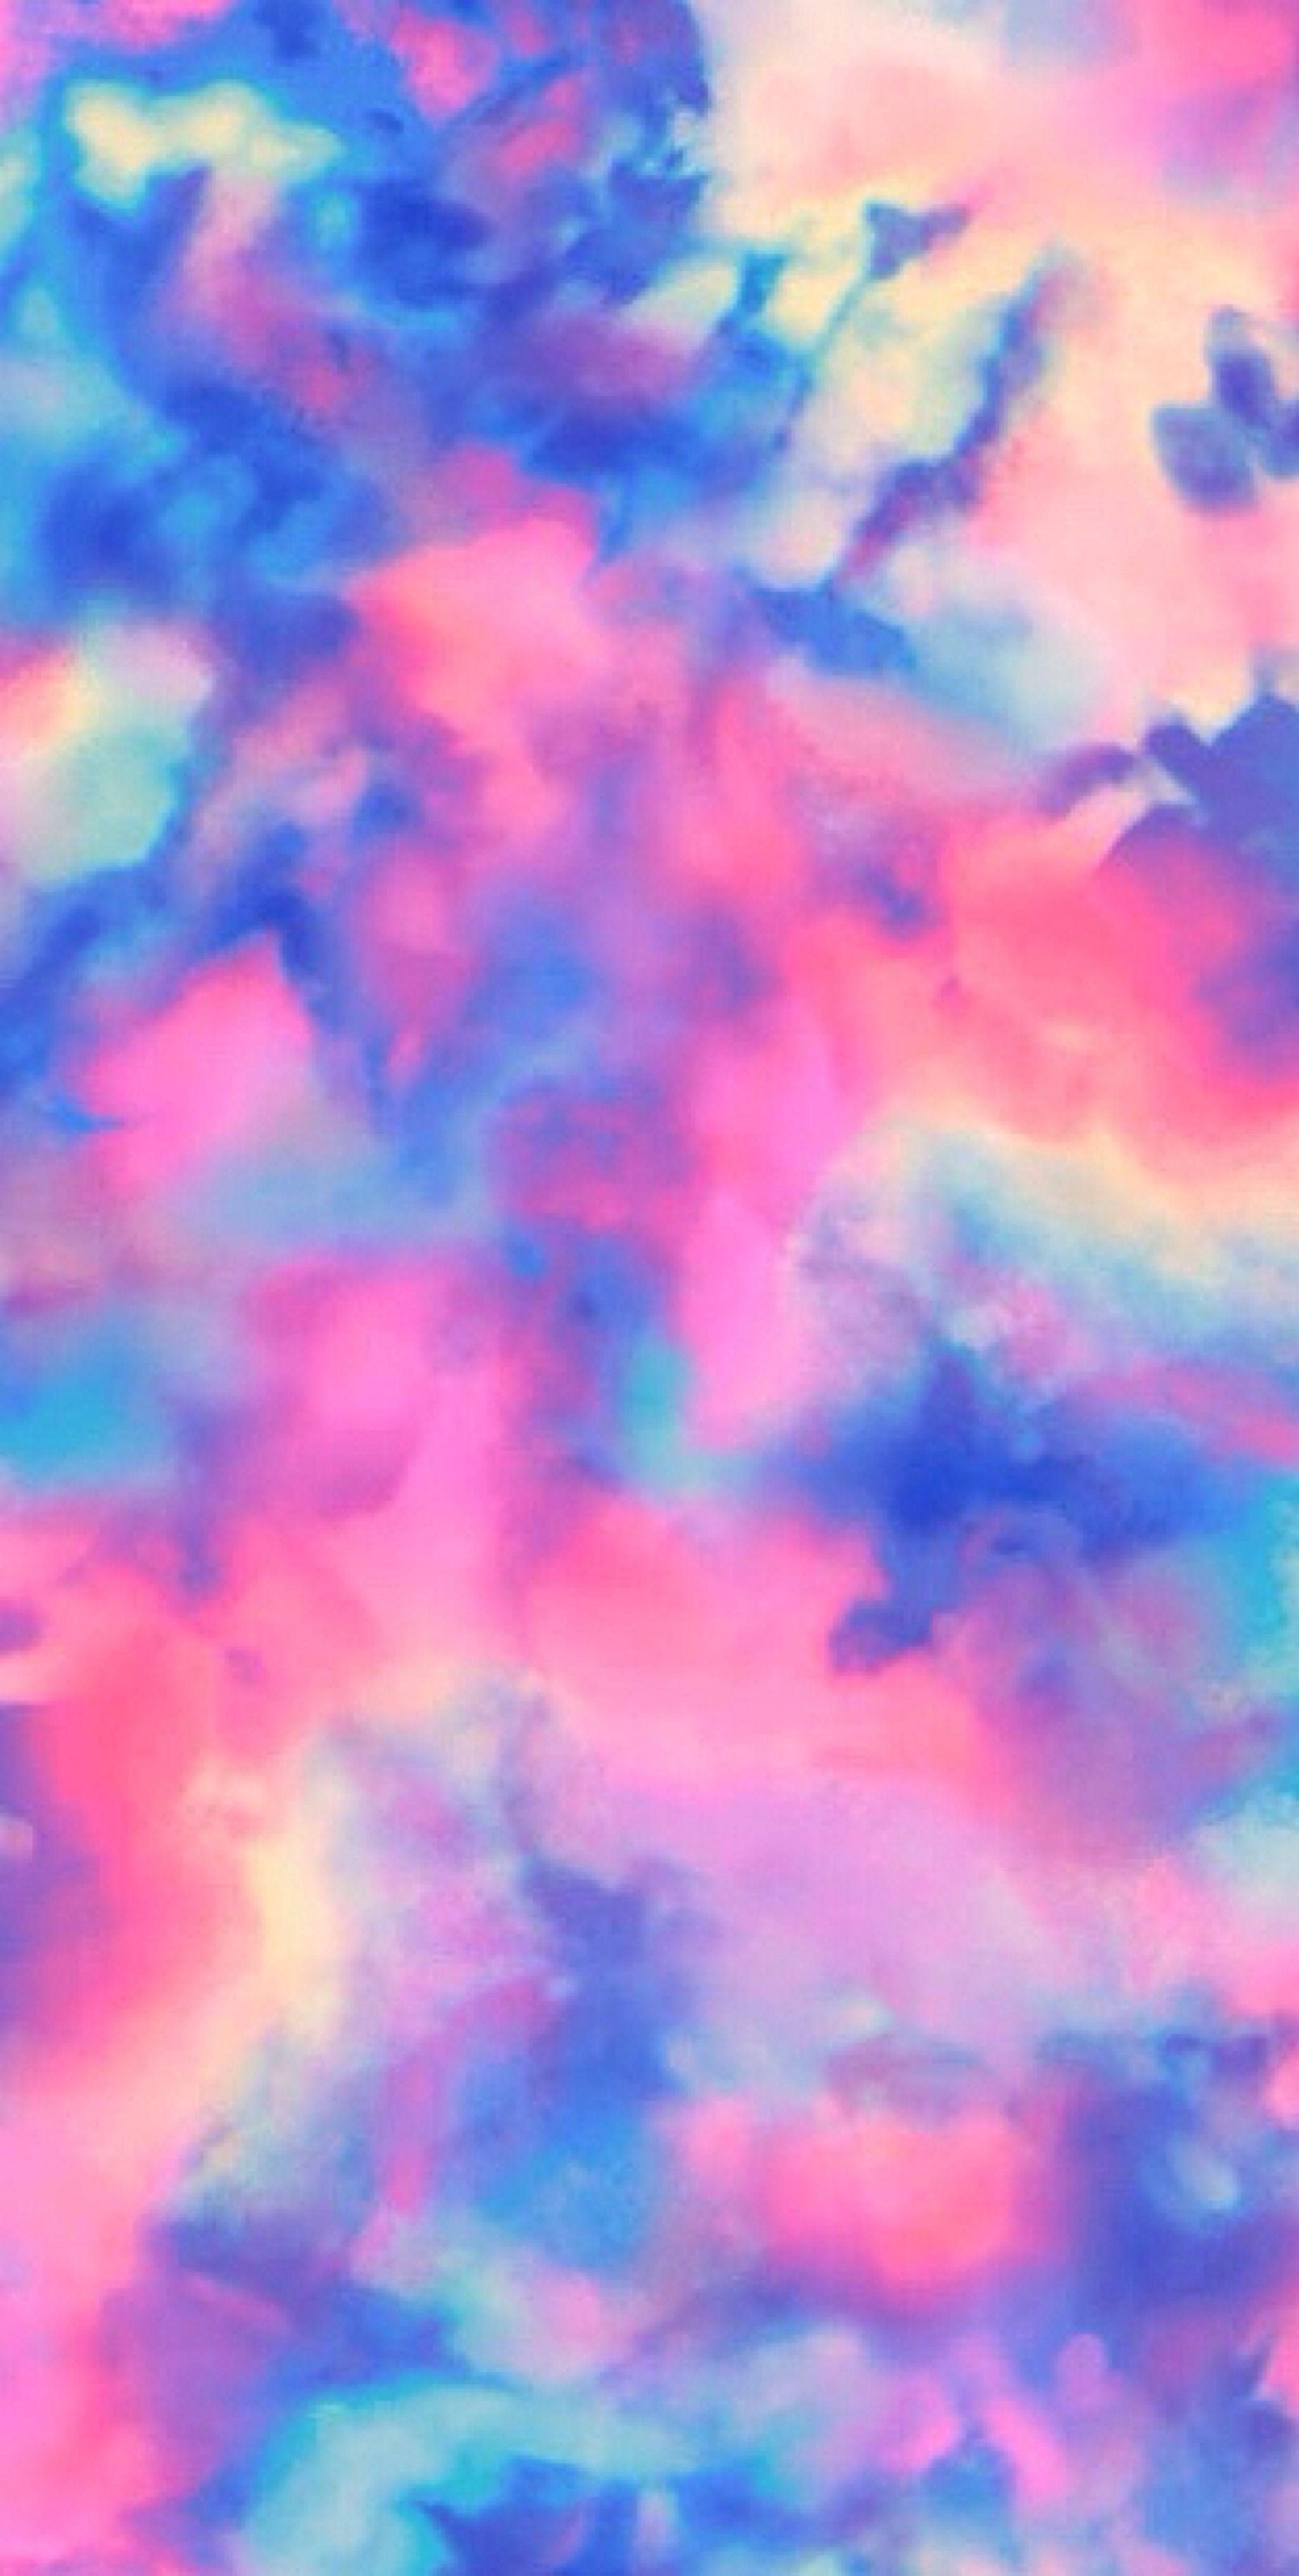 Victoria S Secret Pink Nation Tie Dye Marble Pastel Wallpaper Iphone Background Iphonebackgro Ombre Wallpaper Iphone Tie Dye Wallpaper Marble Iphone Wallpaper